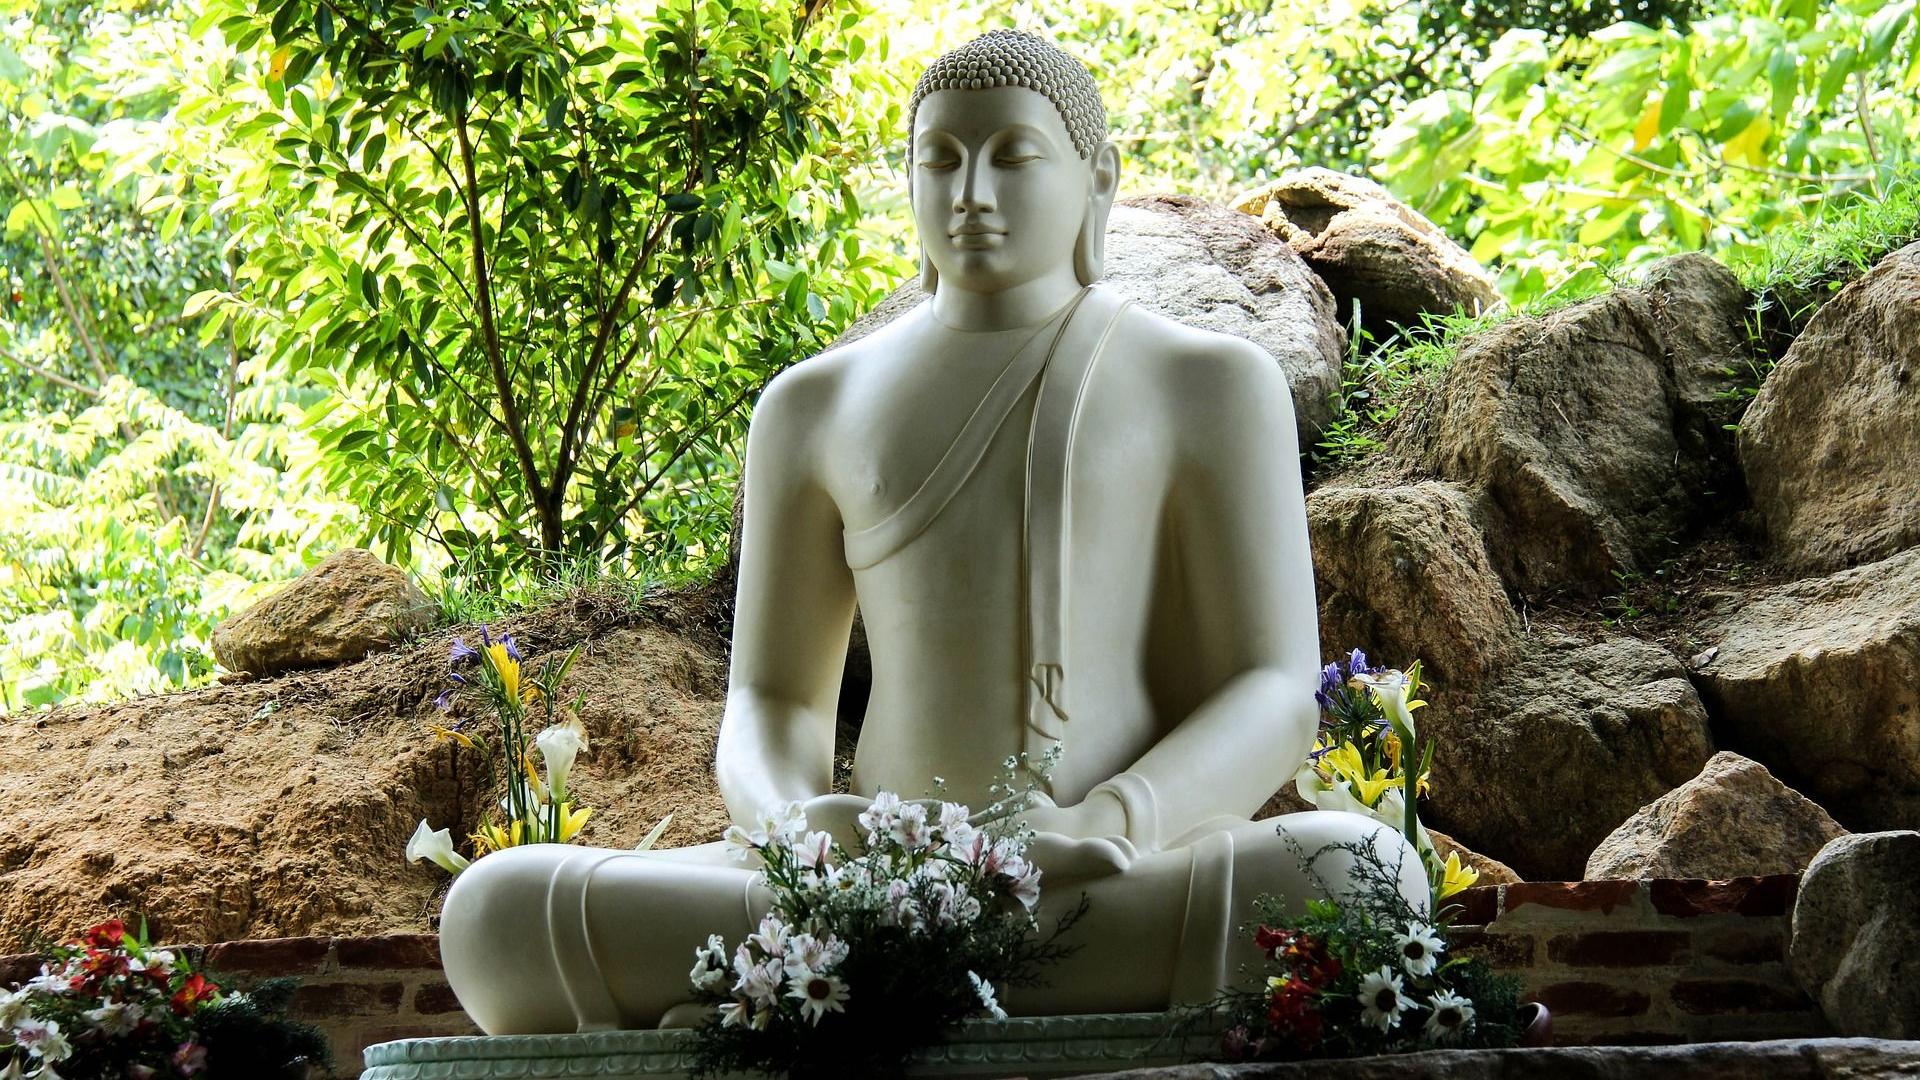 Sri Lanka Tete Bouddah Sagesse Orientale Spiritualite Imaget 1080p